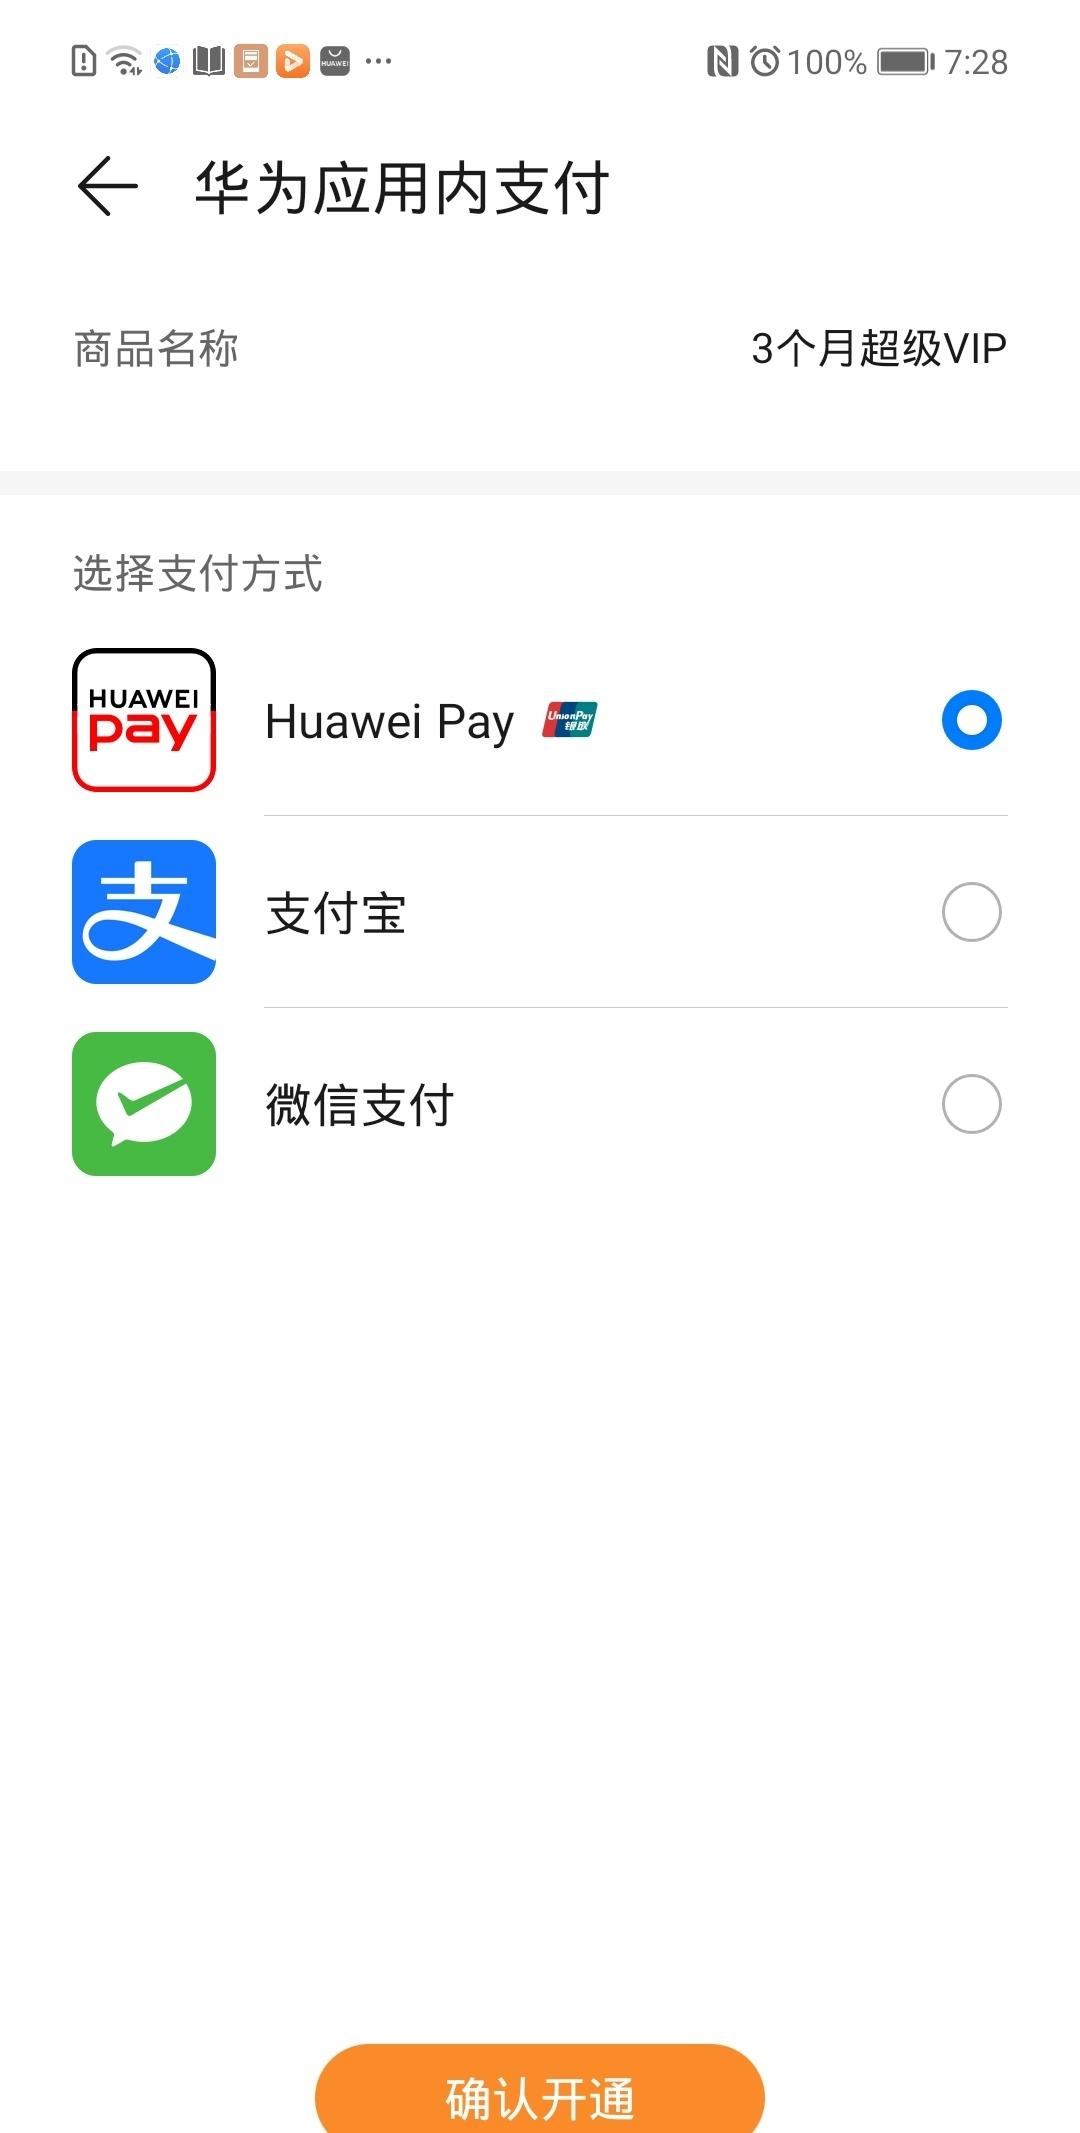 Screenshot_20210326_072858_com.huawei.hwid_edit_162987156892838.jpg